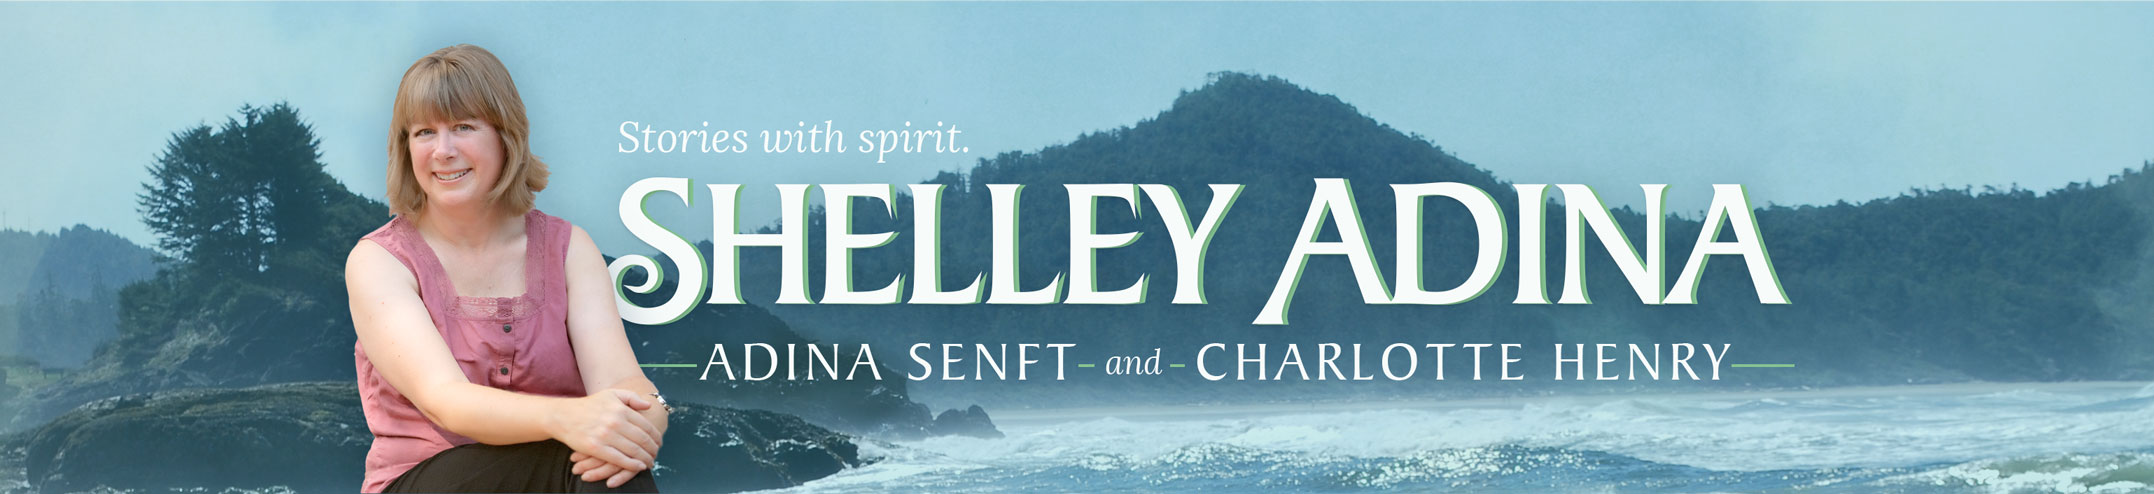 Stories with Spirit - Author Shelley Adina